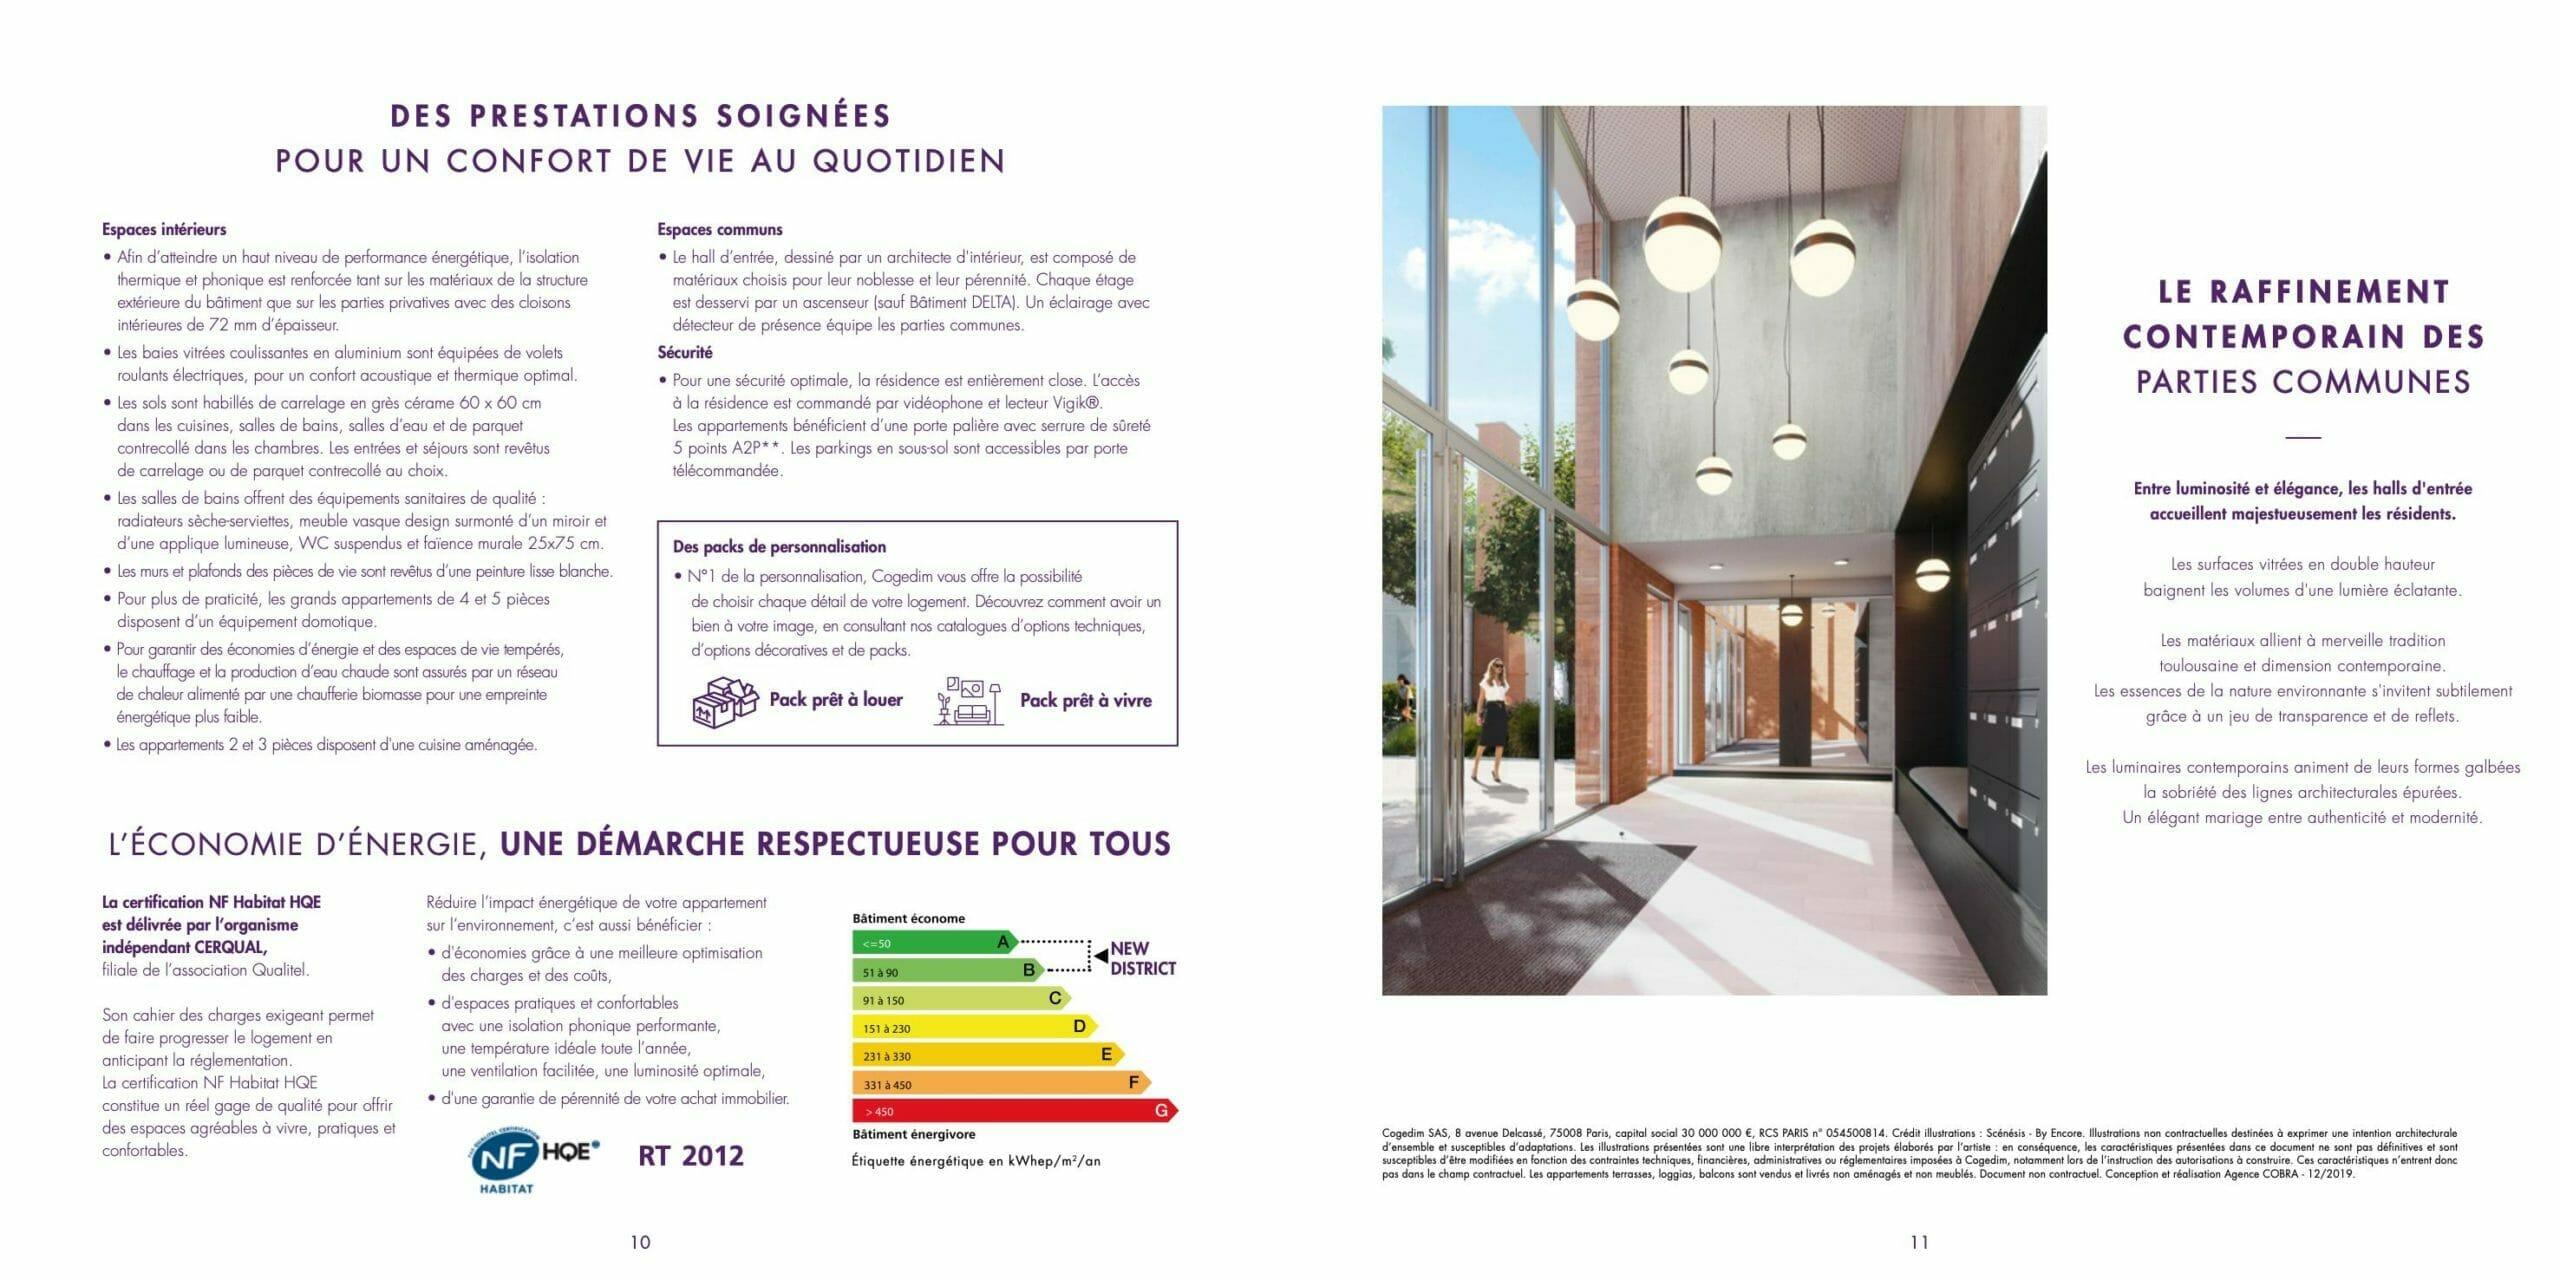 New-District-Altarea-Cogedim-Urbanhouse360-Appartement